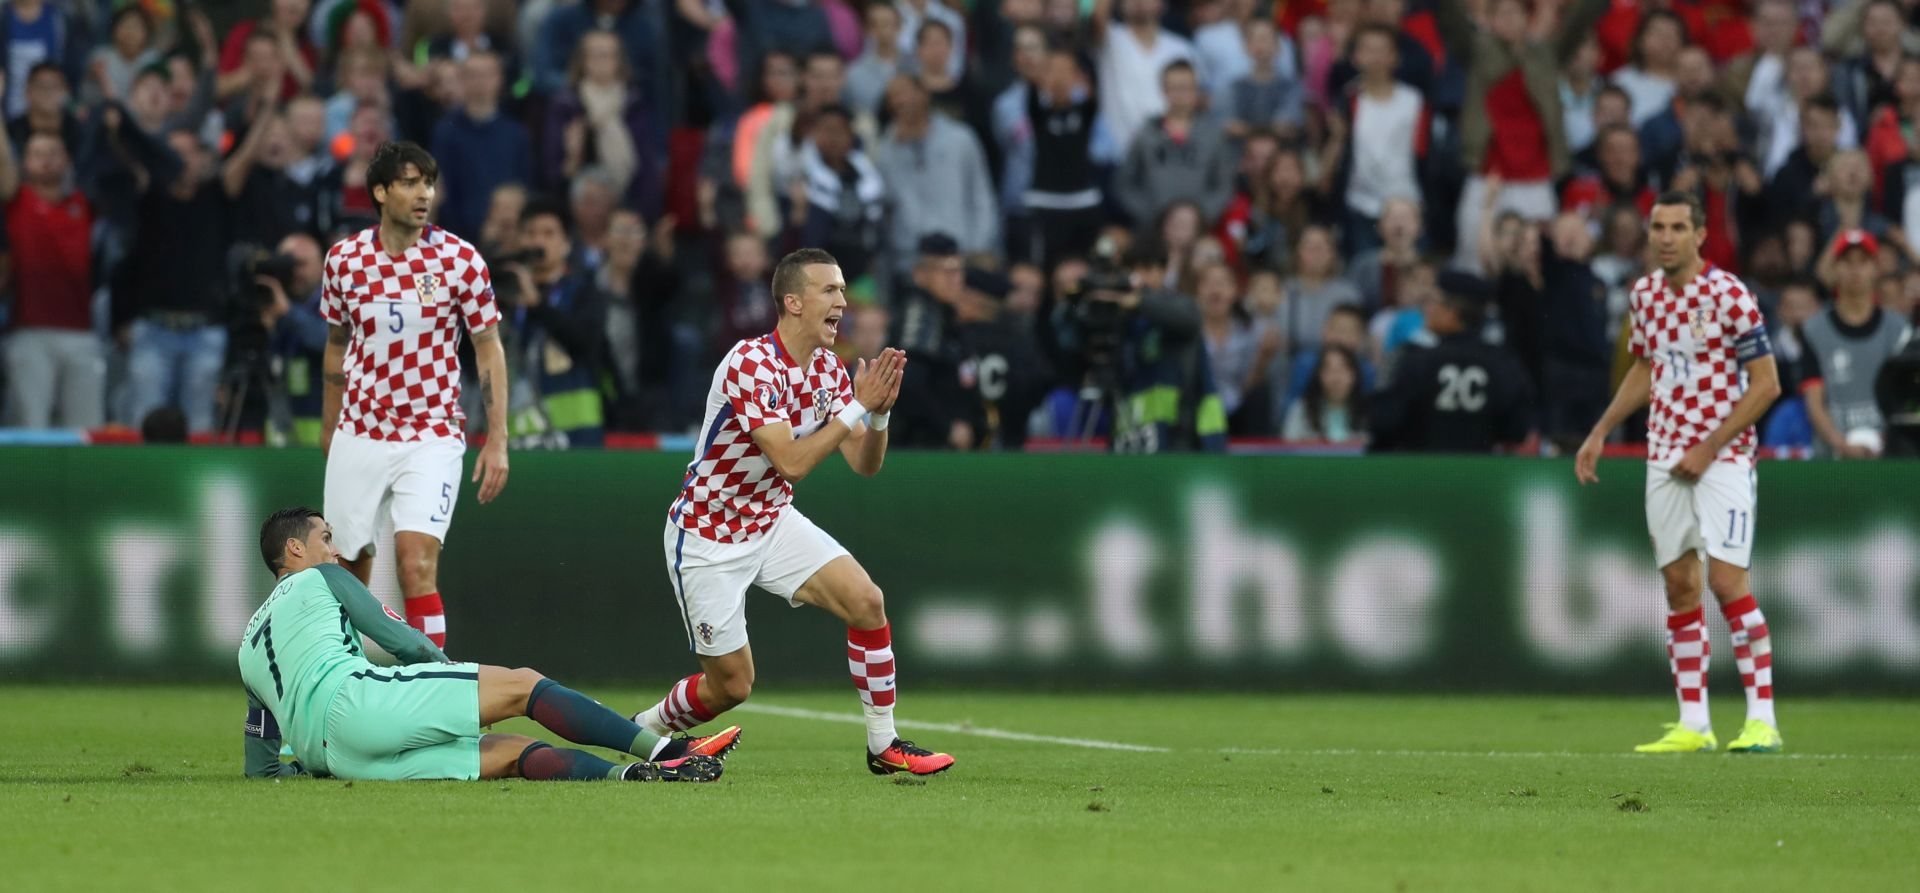 LJUBITELJI NOGOMETA RAZOČARANI Hrvatska i Portugal oborili neke neslavne rekorde